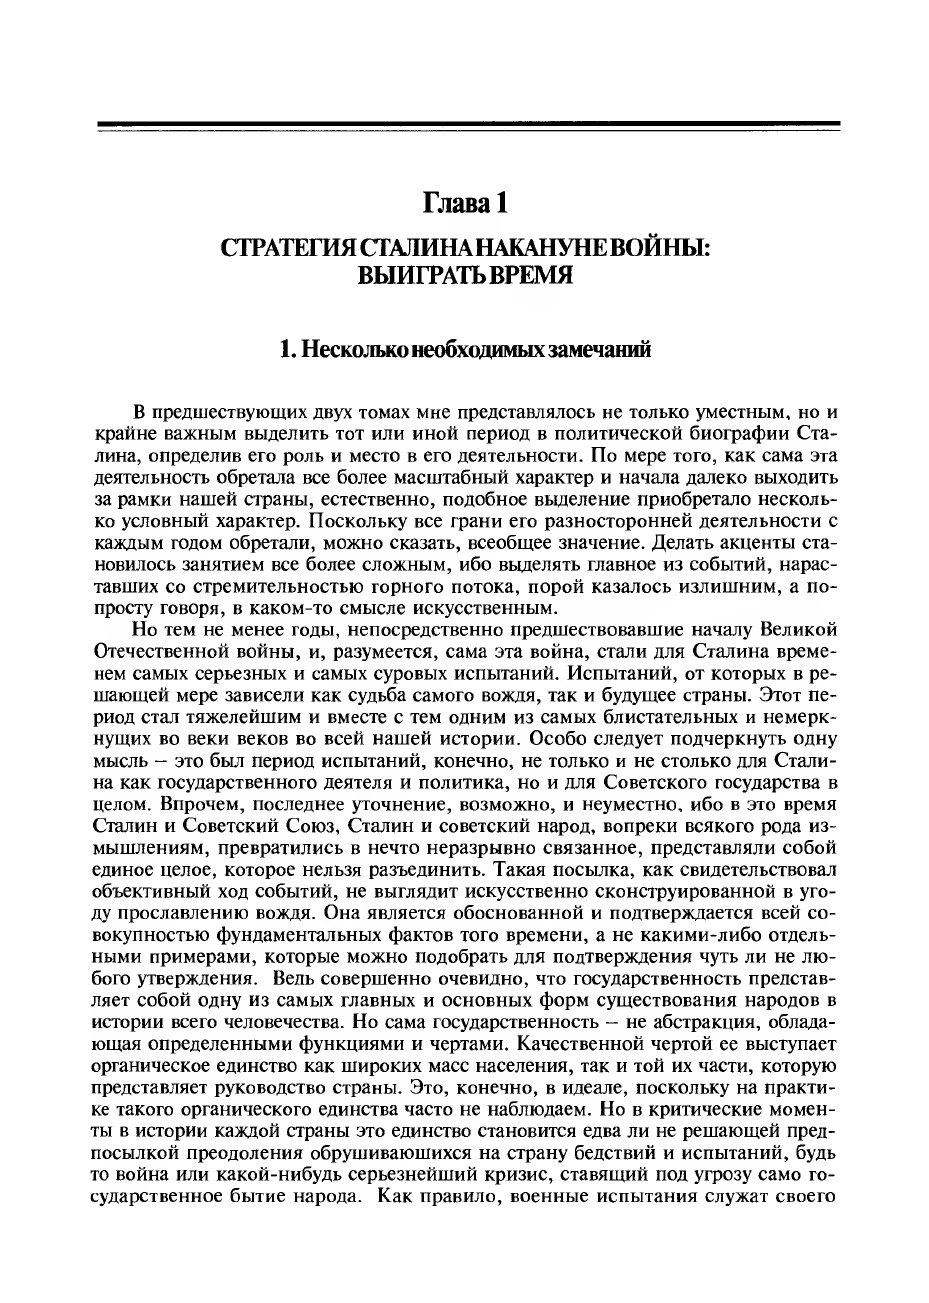 http://images.vfl.ru/ii/1406824145/55c44ed0/5860230.jpg